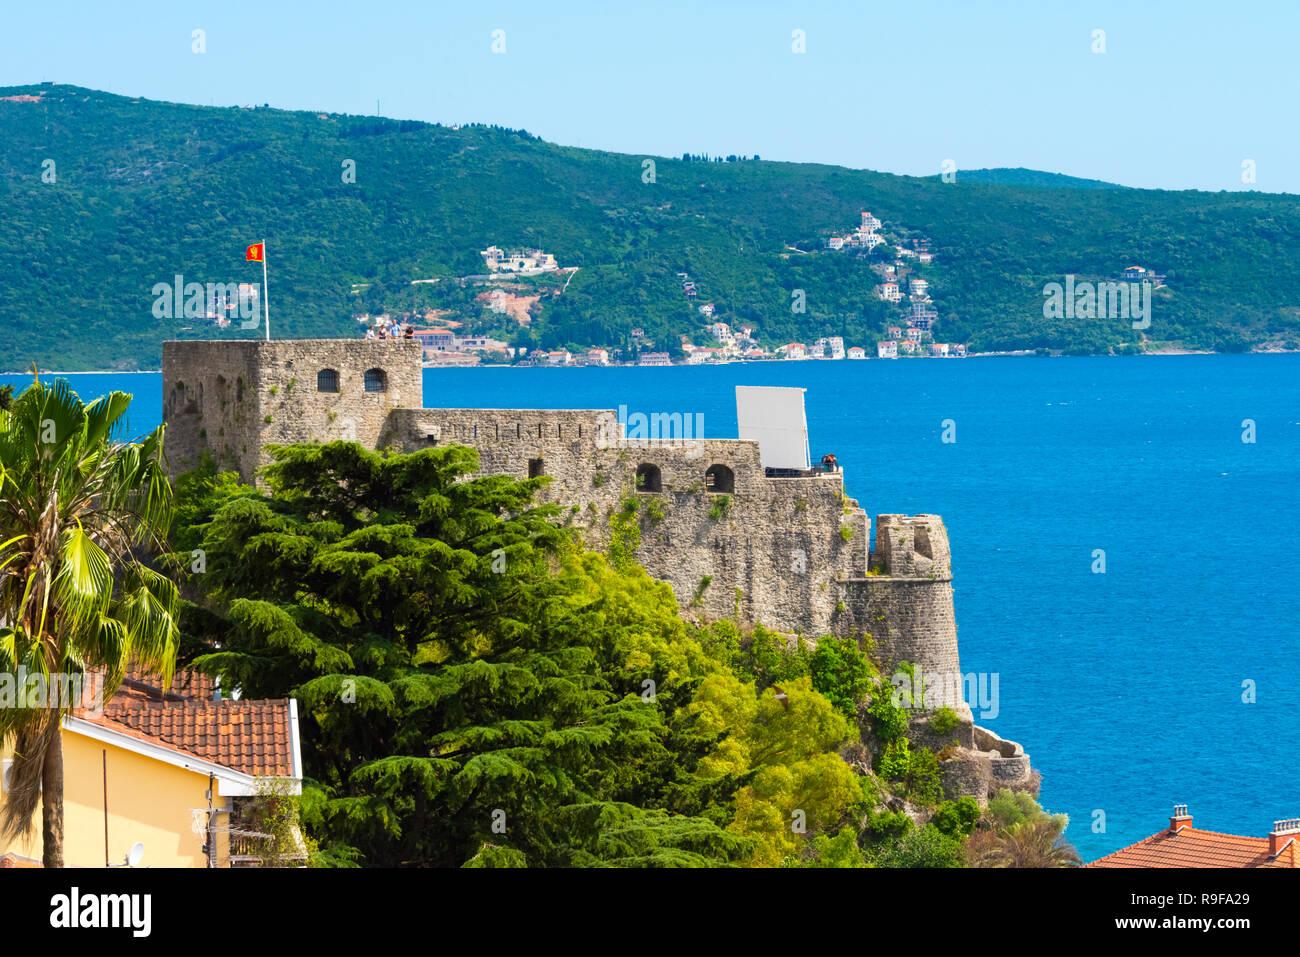 The Fortress of 'Stari Grad' on the Adriatic coast, Herceg Novi, Montenegro - Stock Image